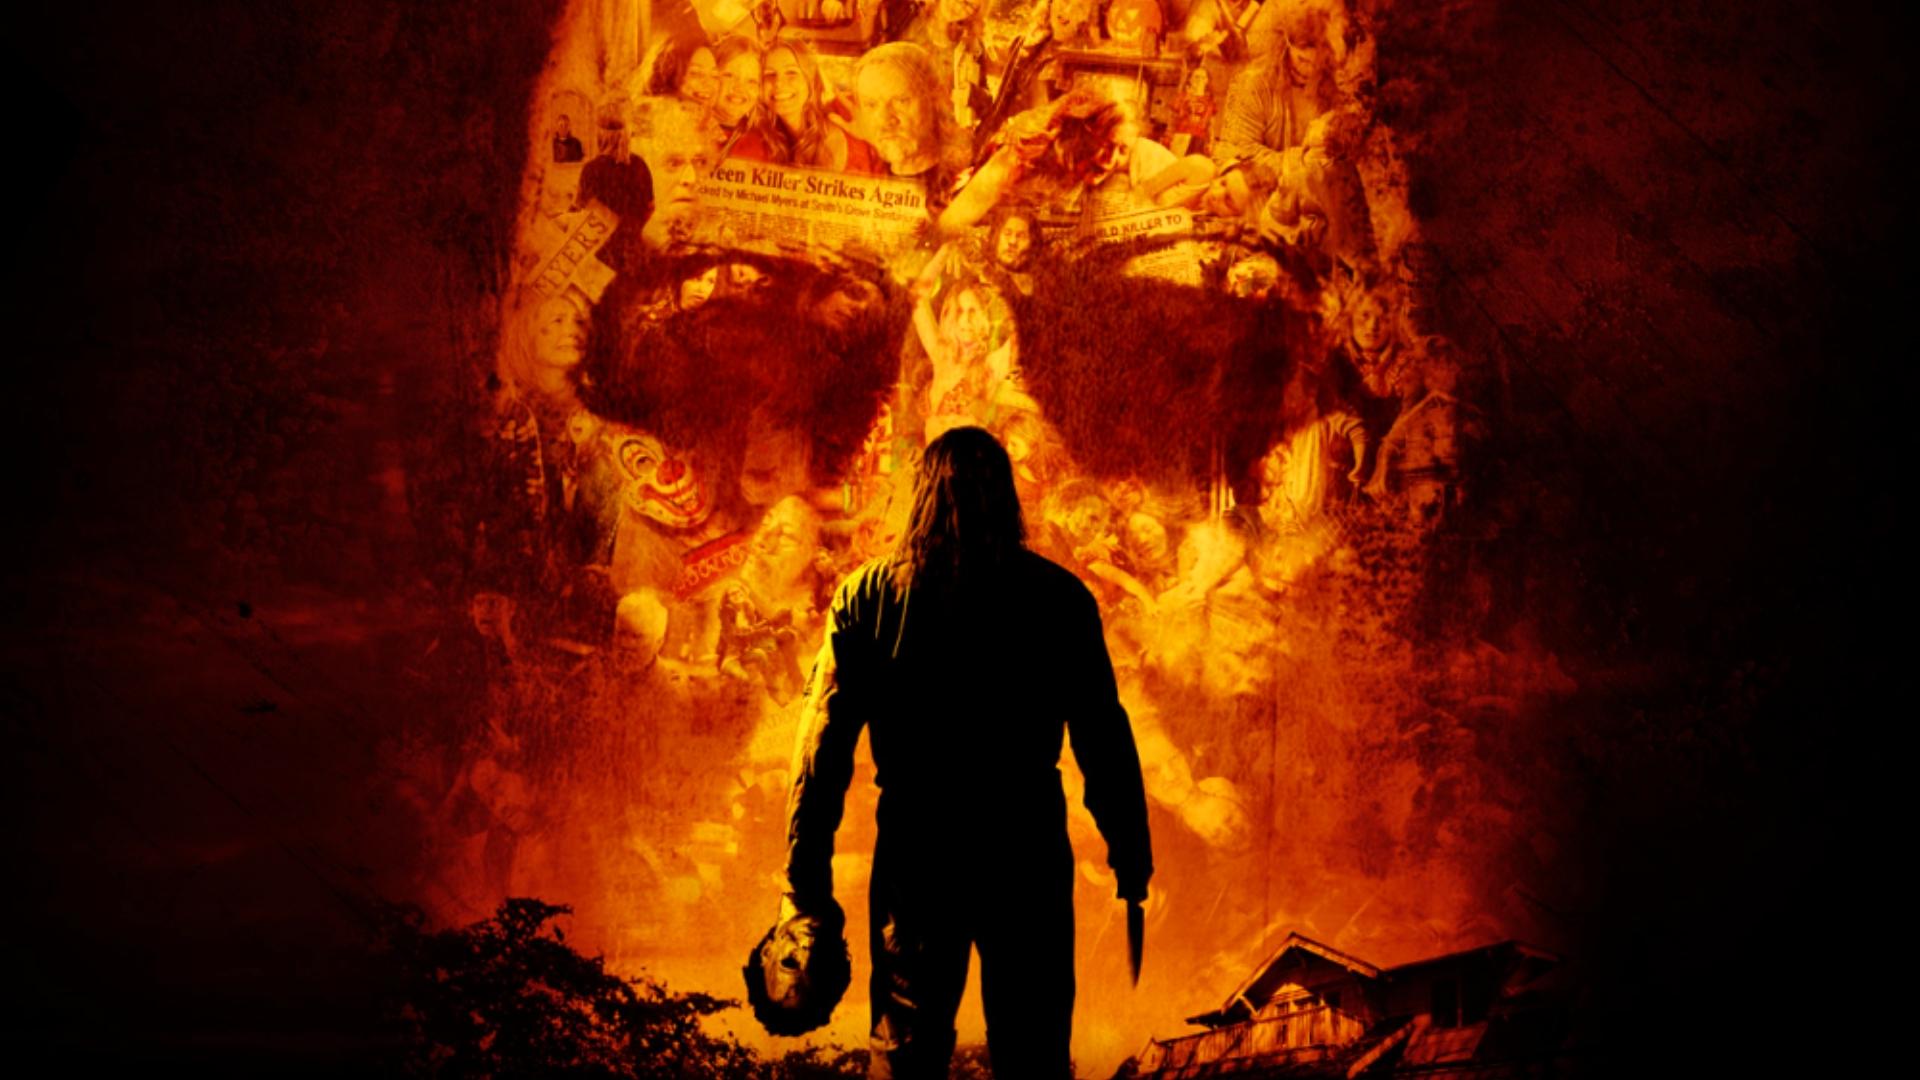 halloween collection (rob zombie series) | movie fanart | fanart.tv